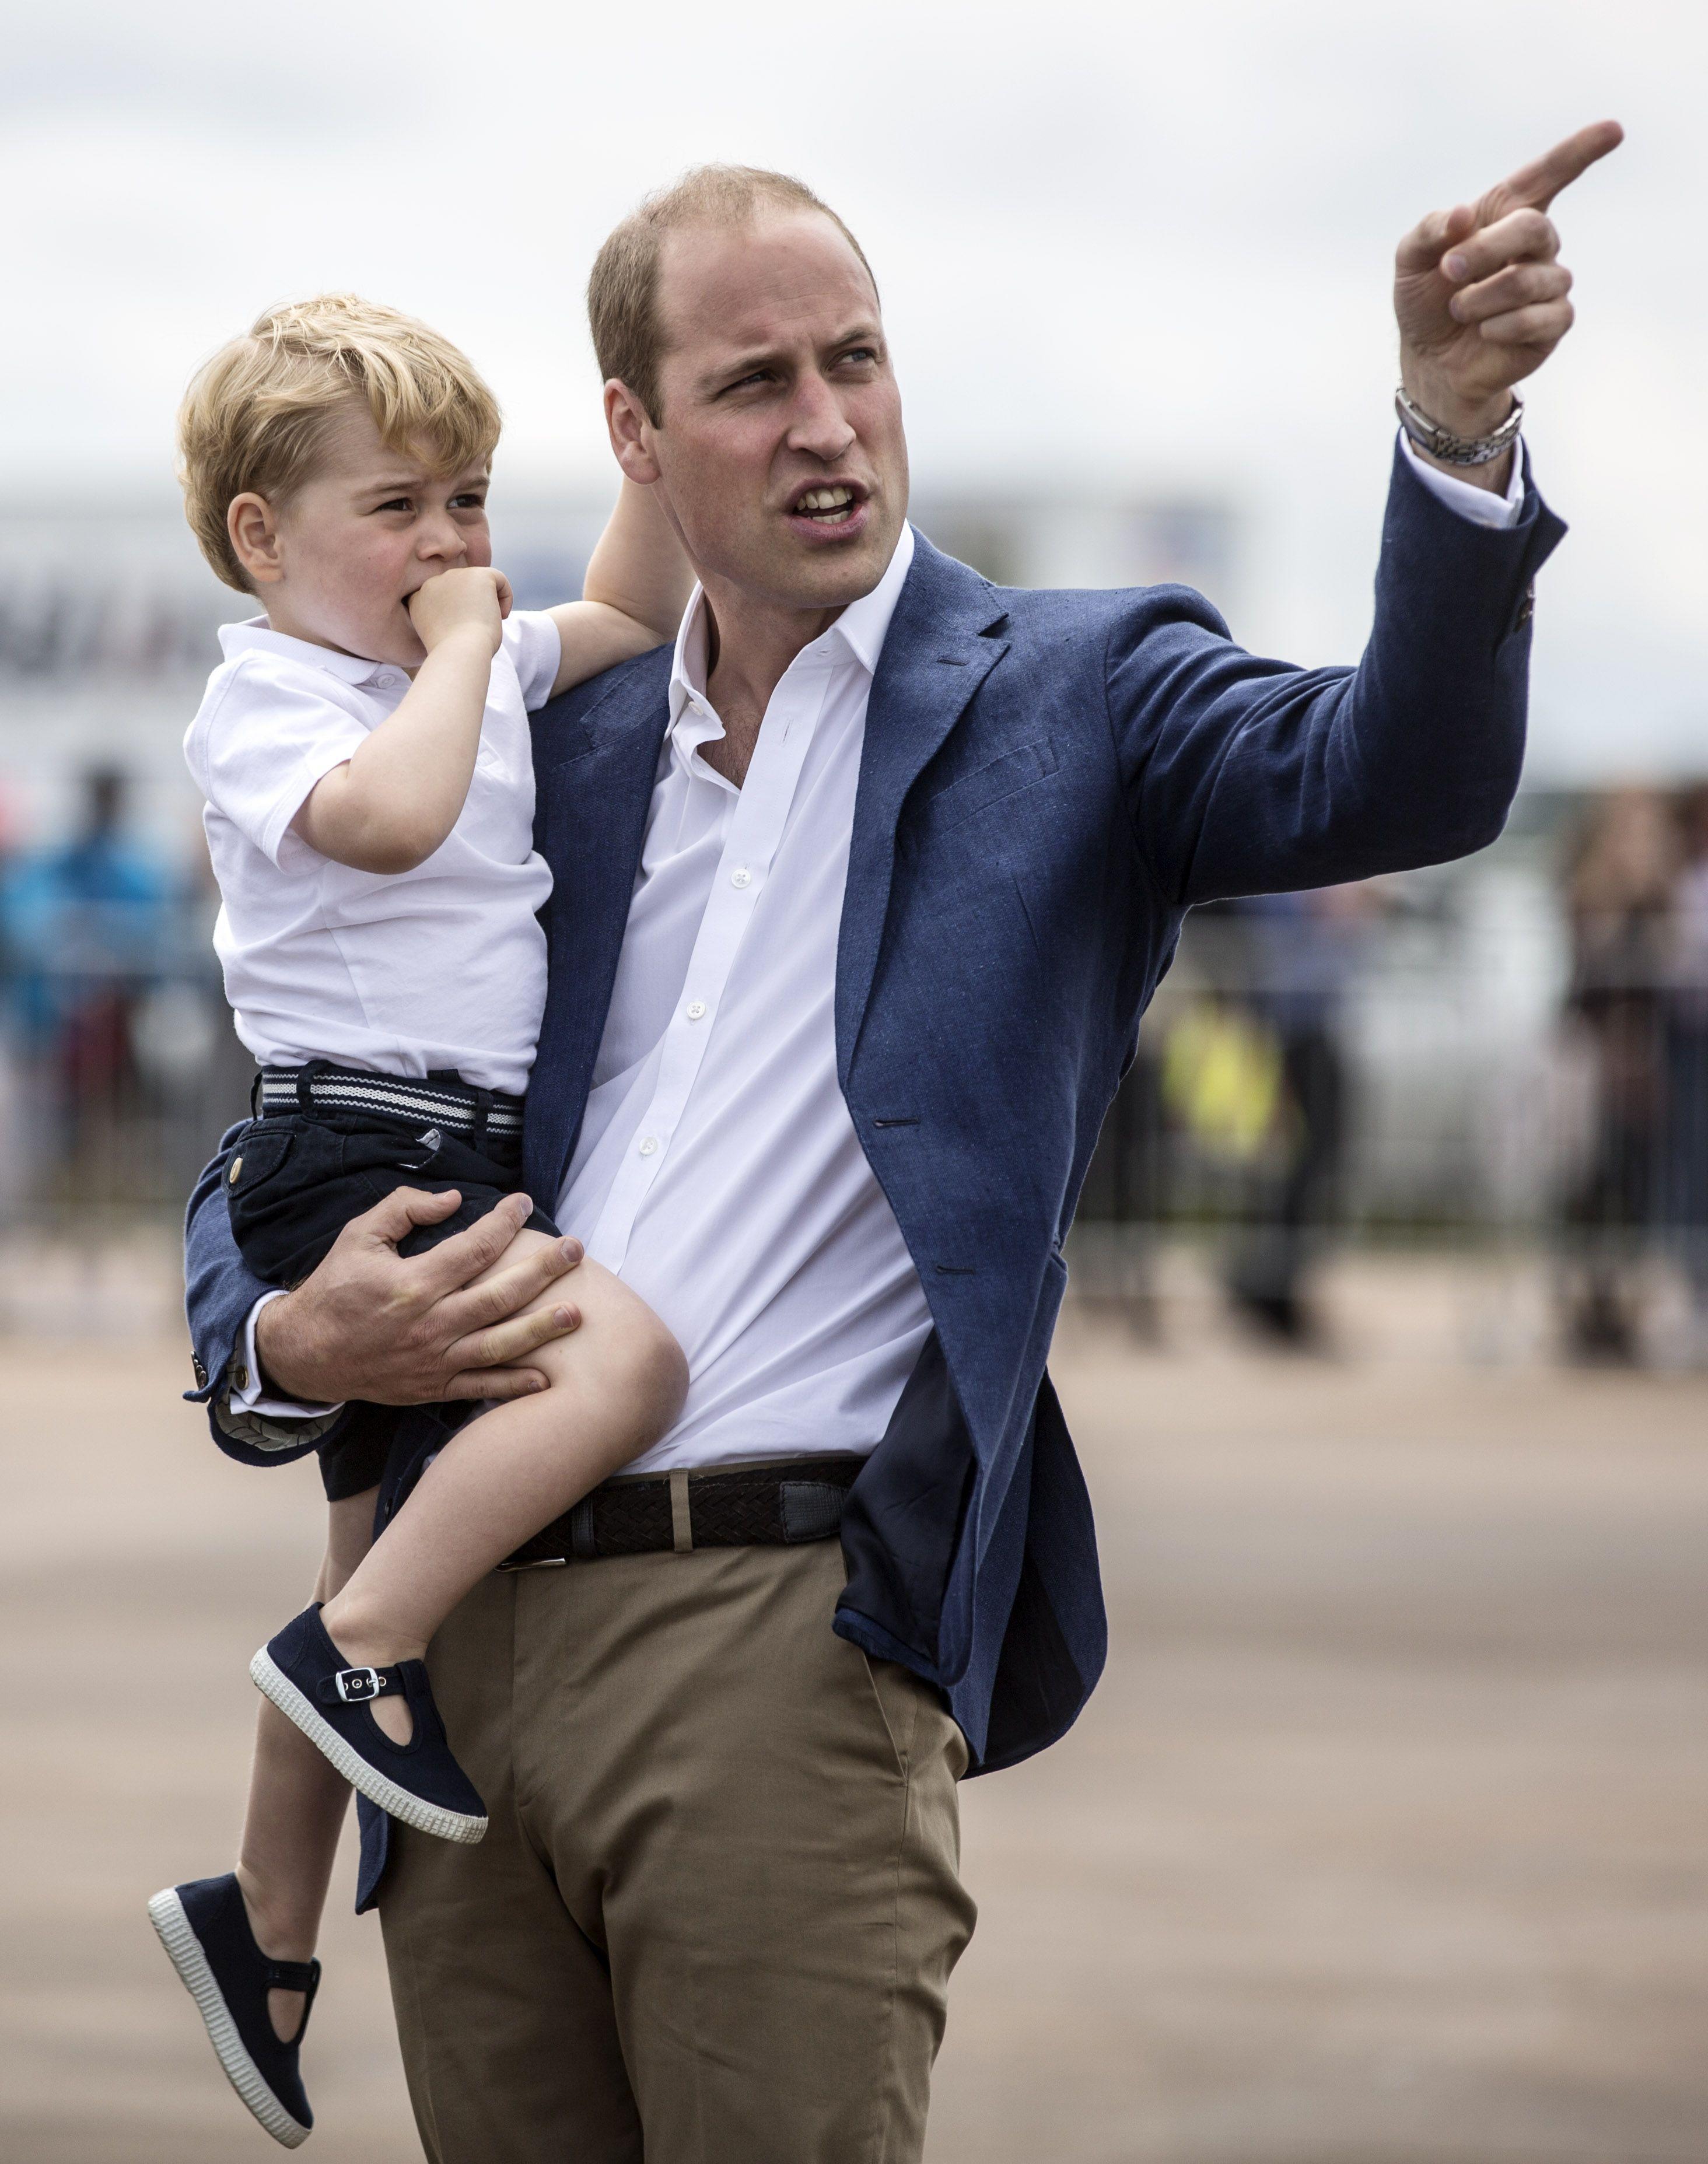 Forum on this topic: Prince Williams Nicknames for Charlotte and George , prince-williams-nicknames-for-charlotte-and-george/